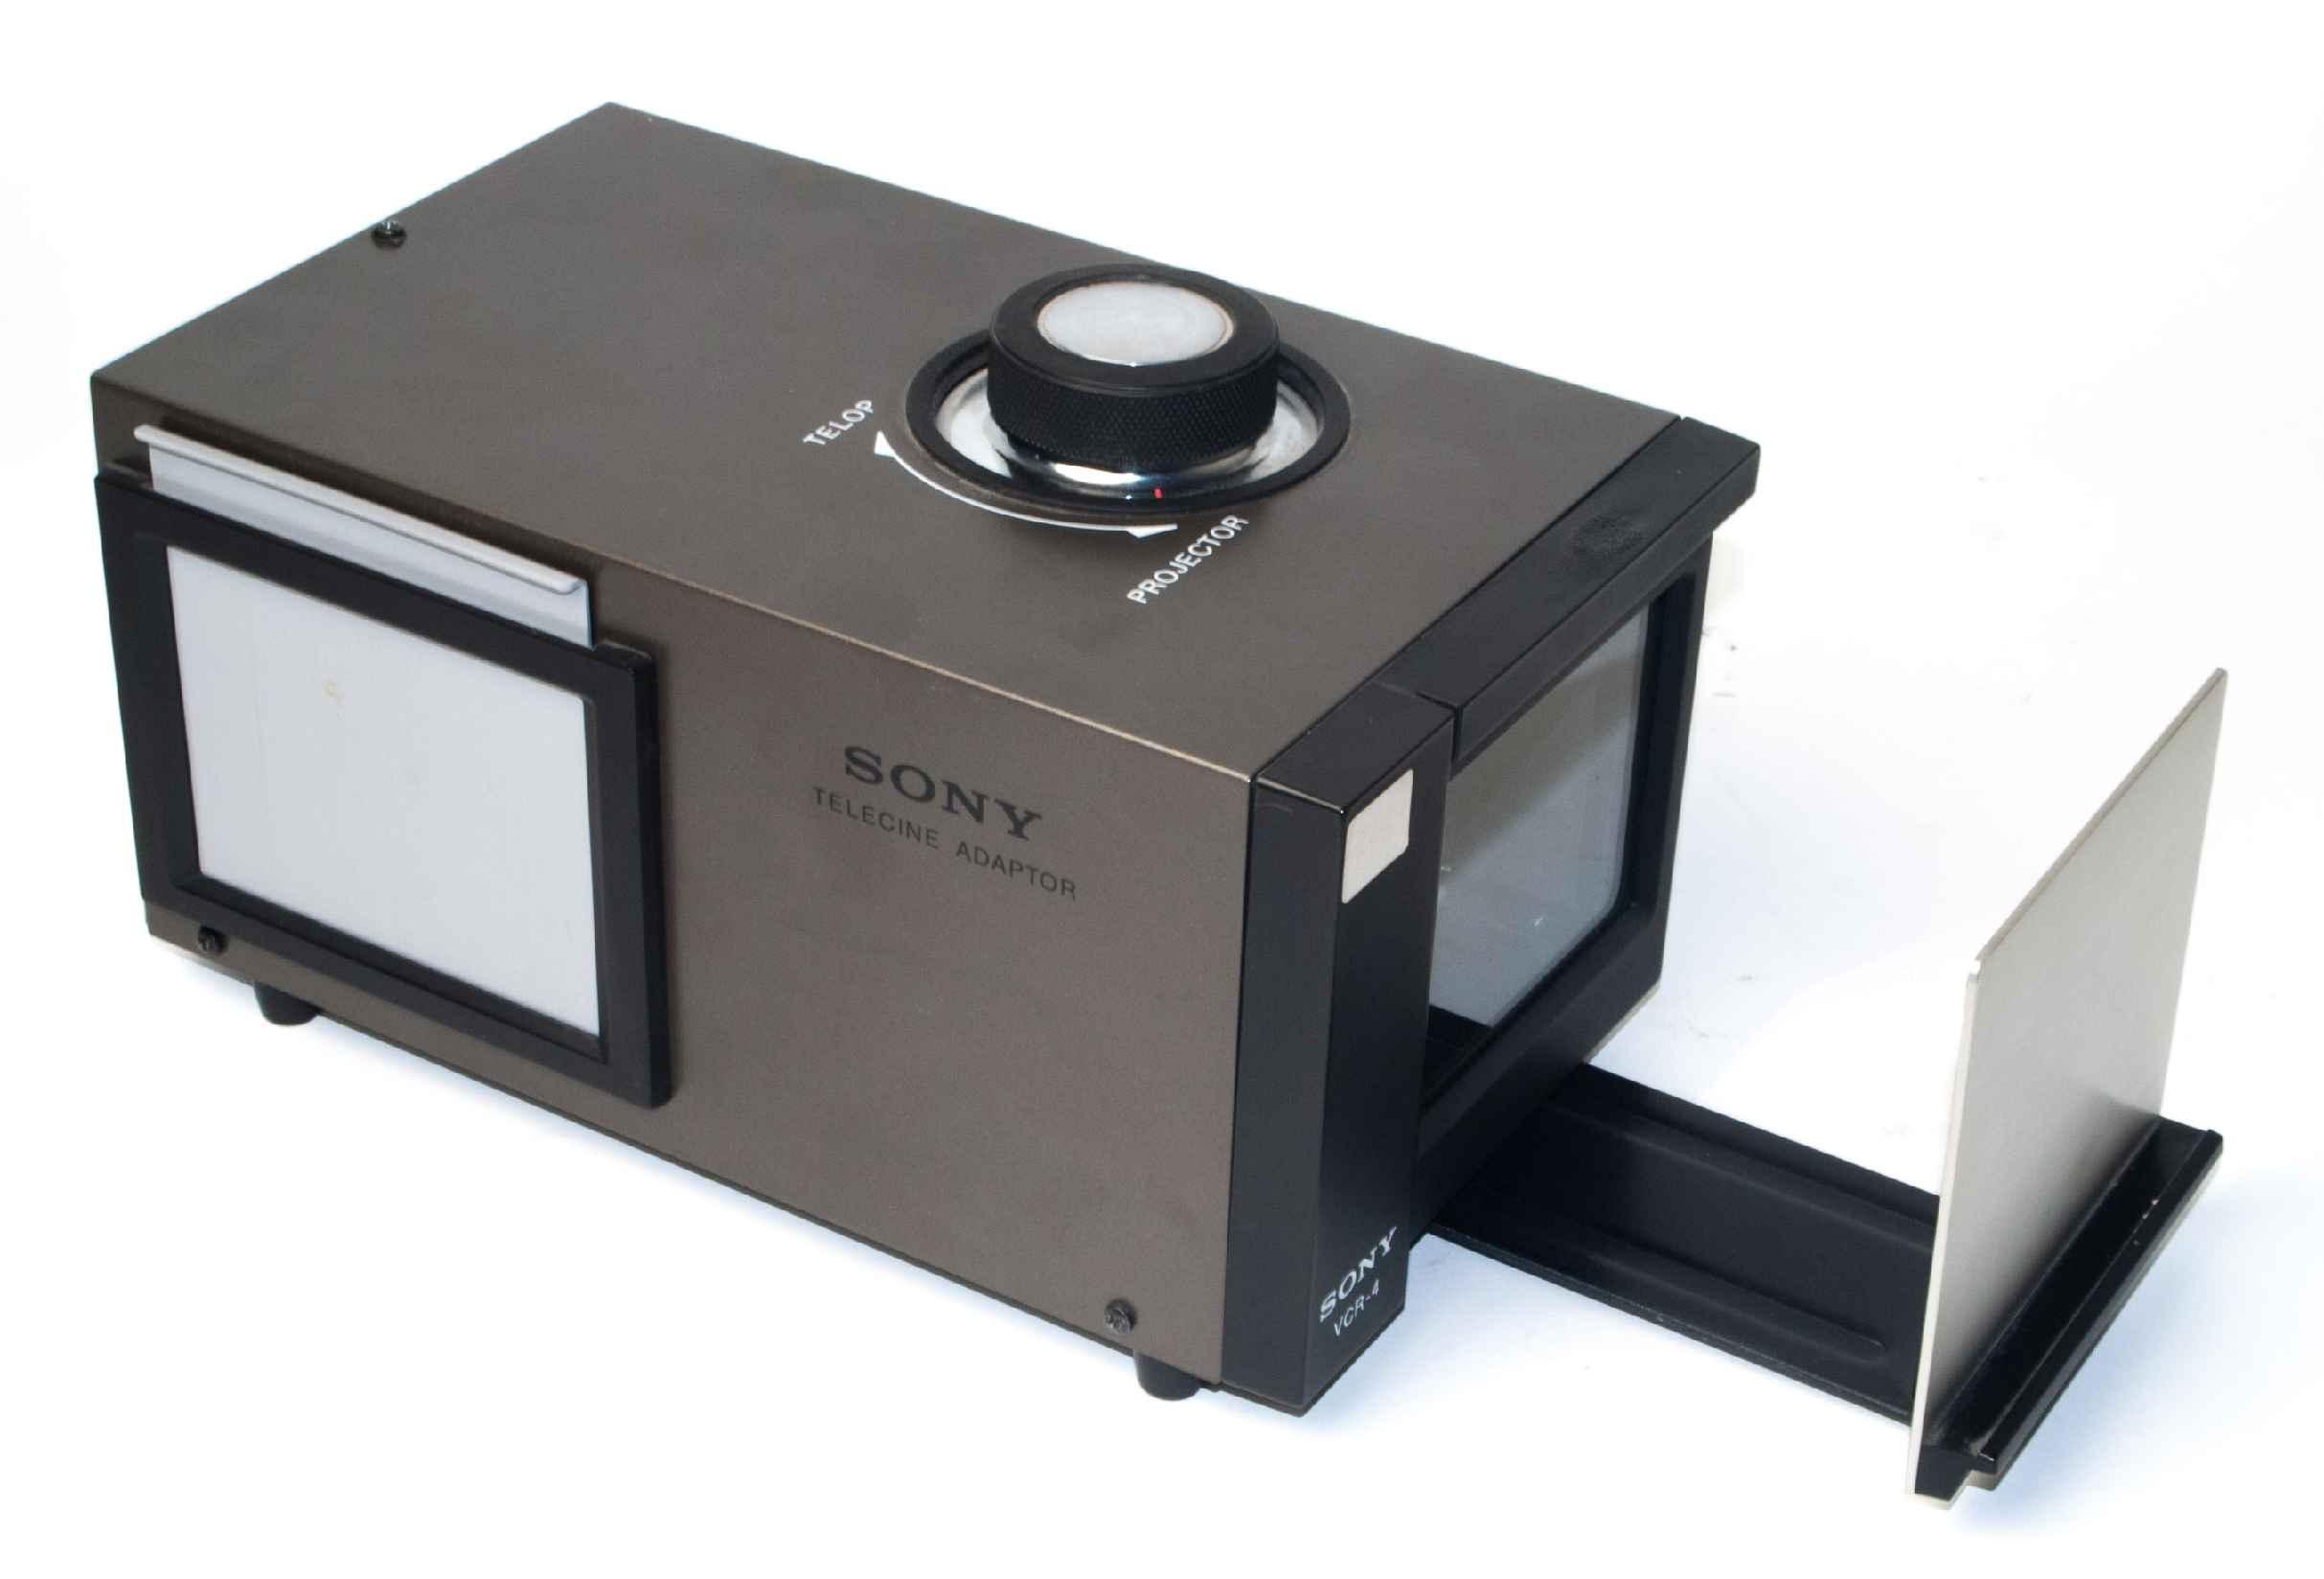 Sony VCR-4 Telecine Adaptor (used)